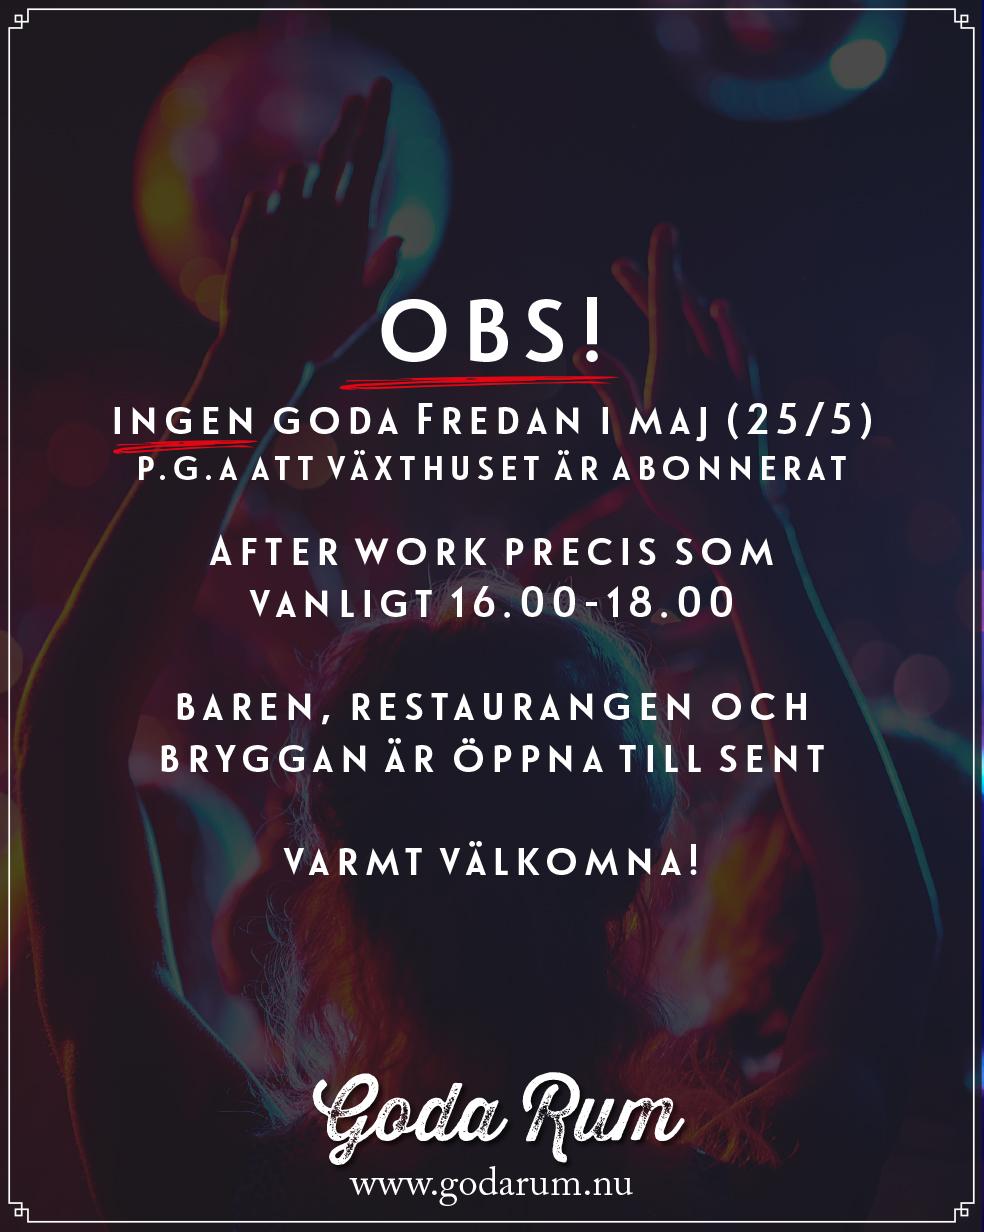 Kommande Evenemang | OBS! Ingen Goda Fredan 25/5